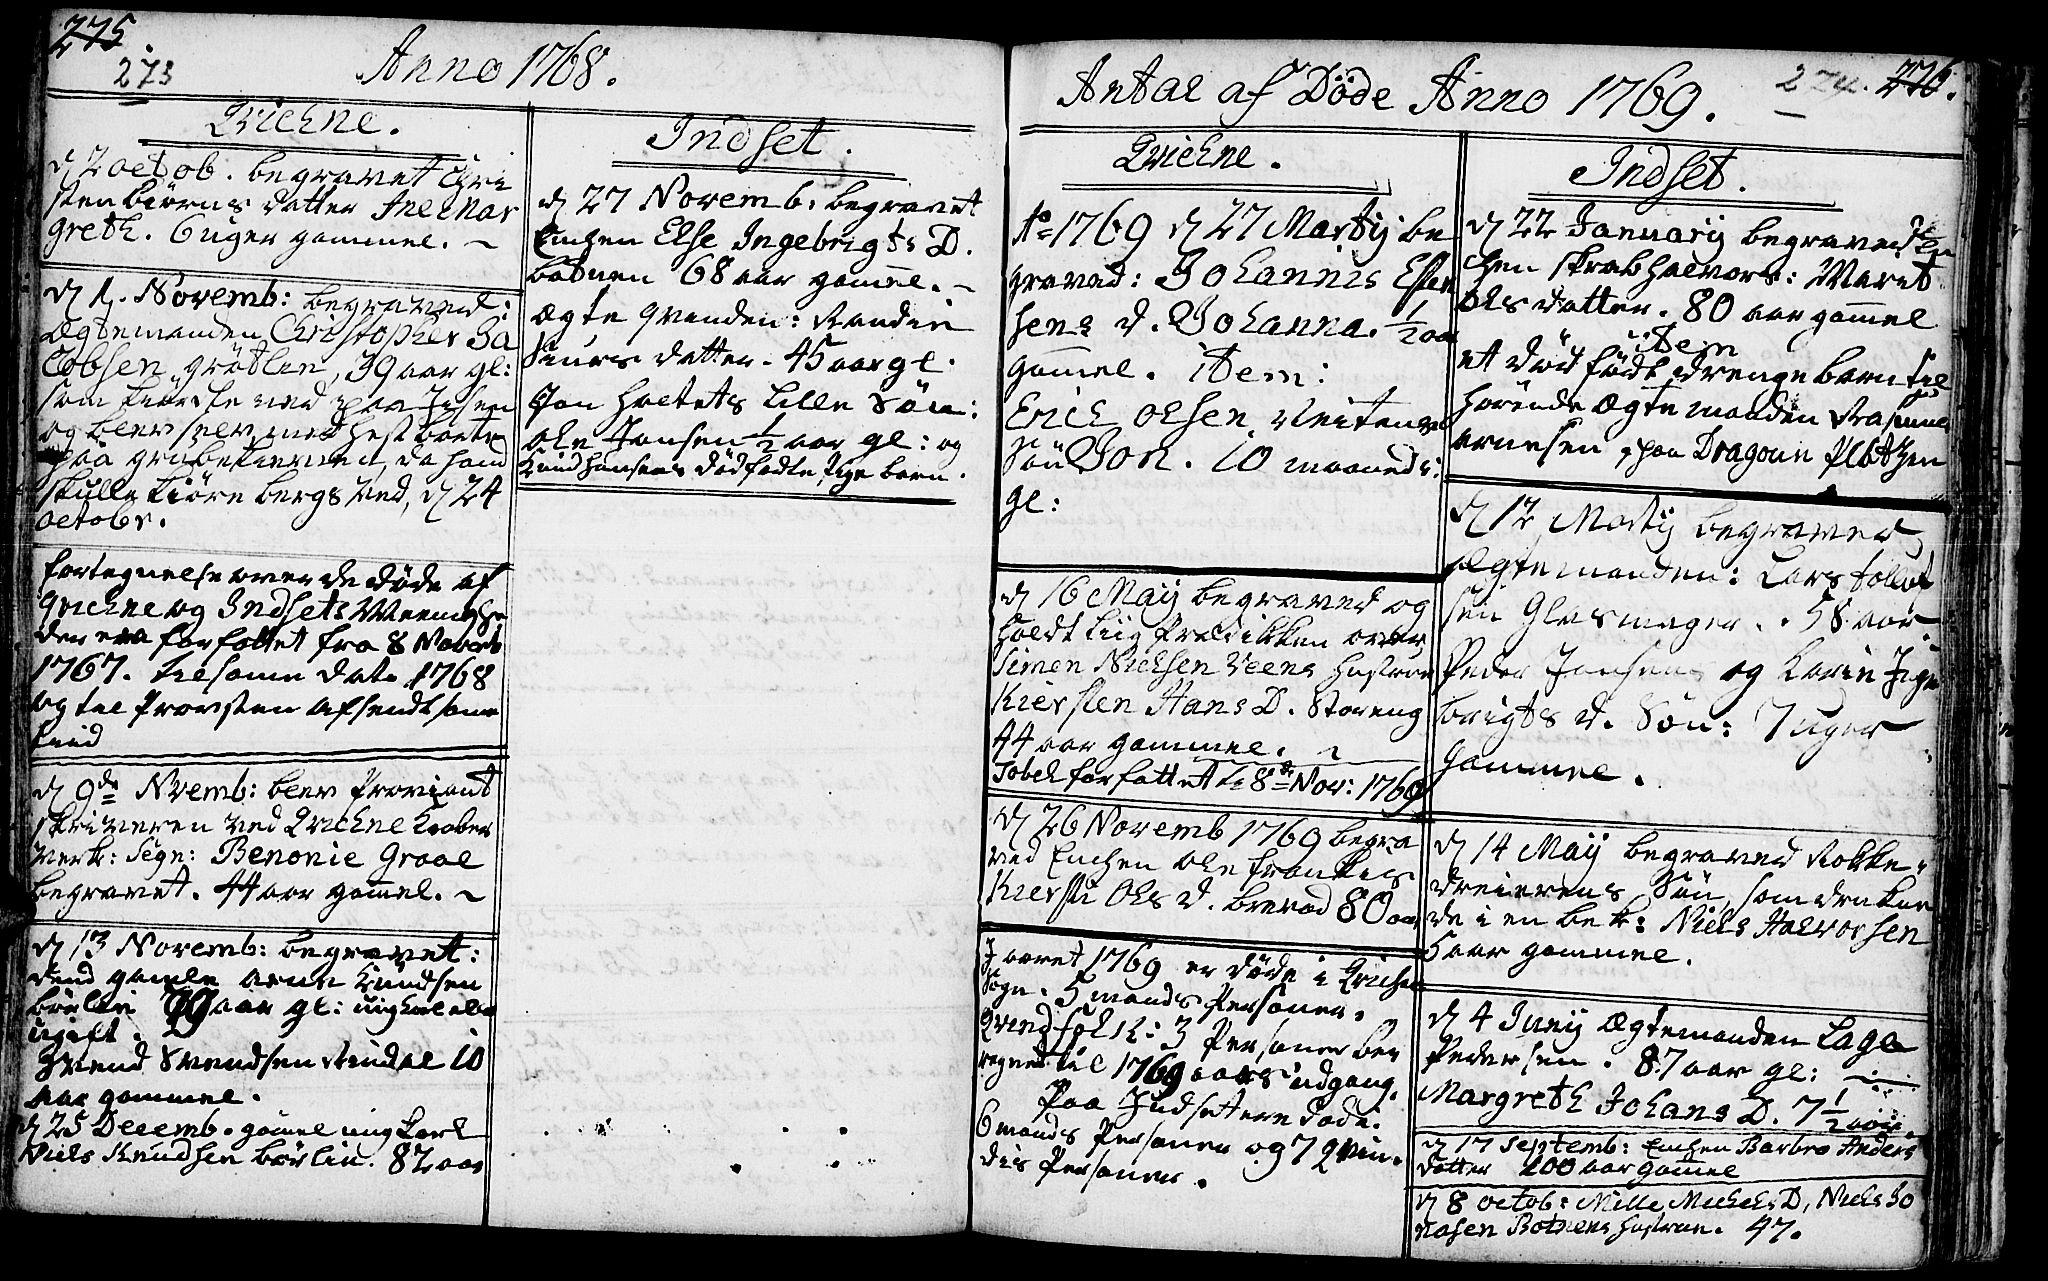 SAH, Kvikne prestekontor, Ministerialbok nr. 2, 1764-1784, s. 273-274